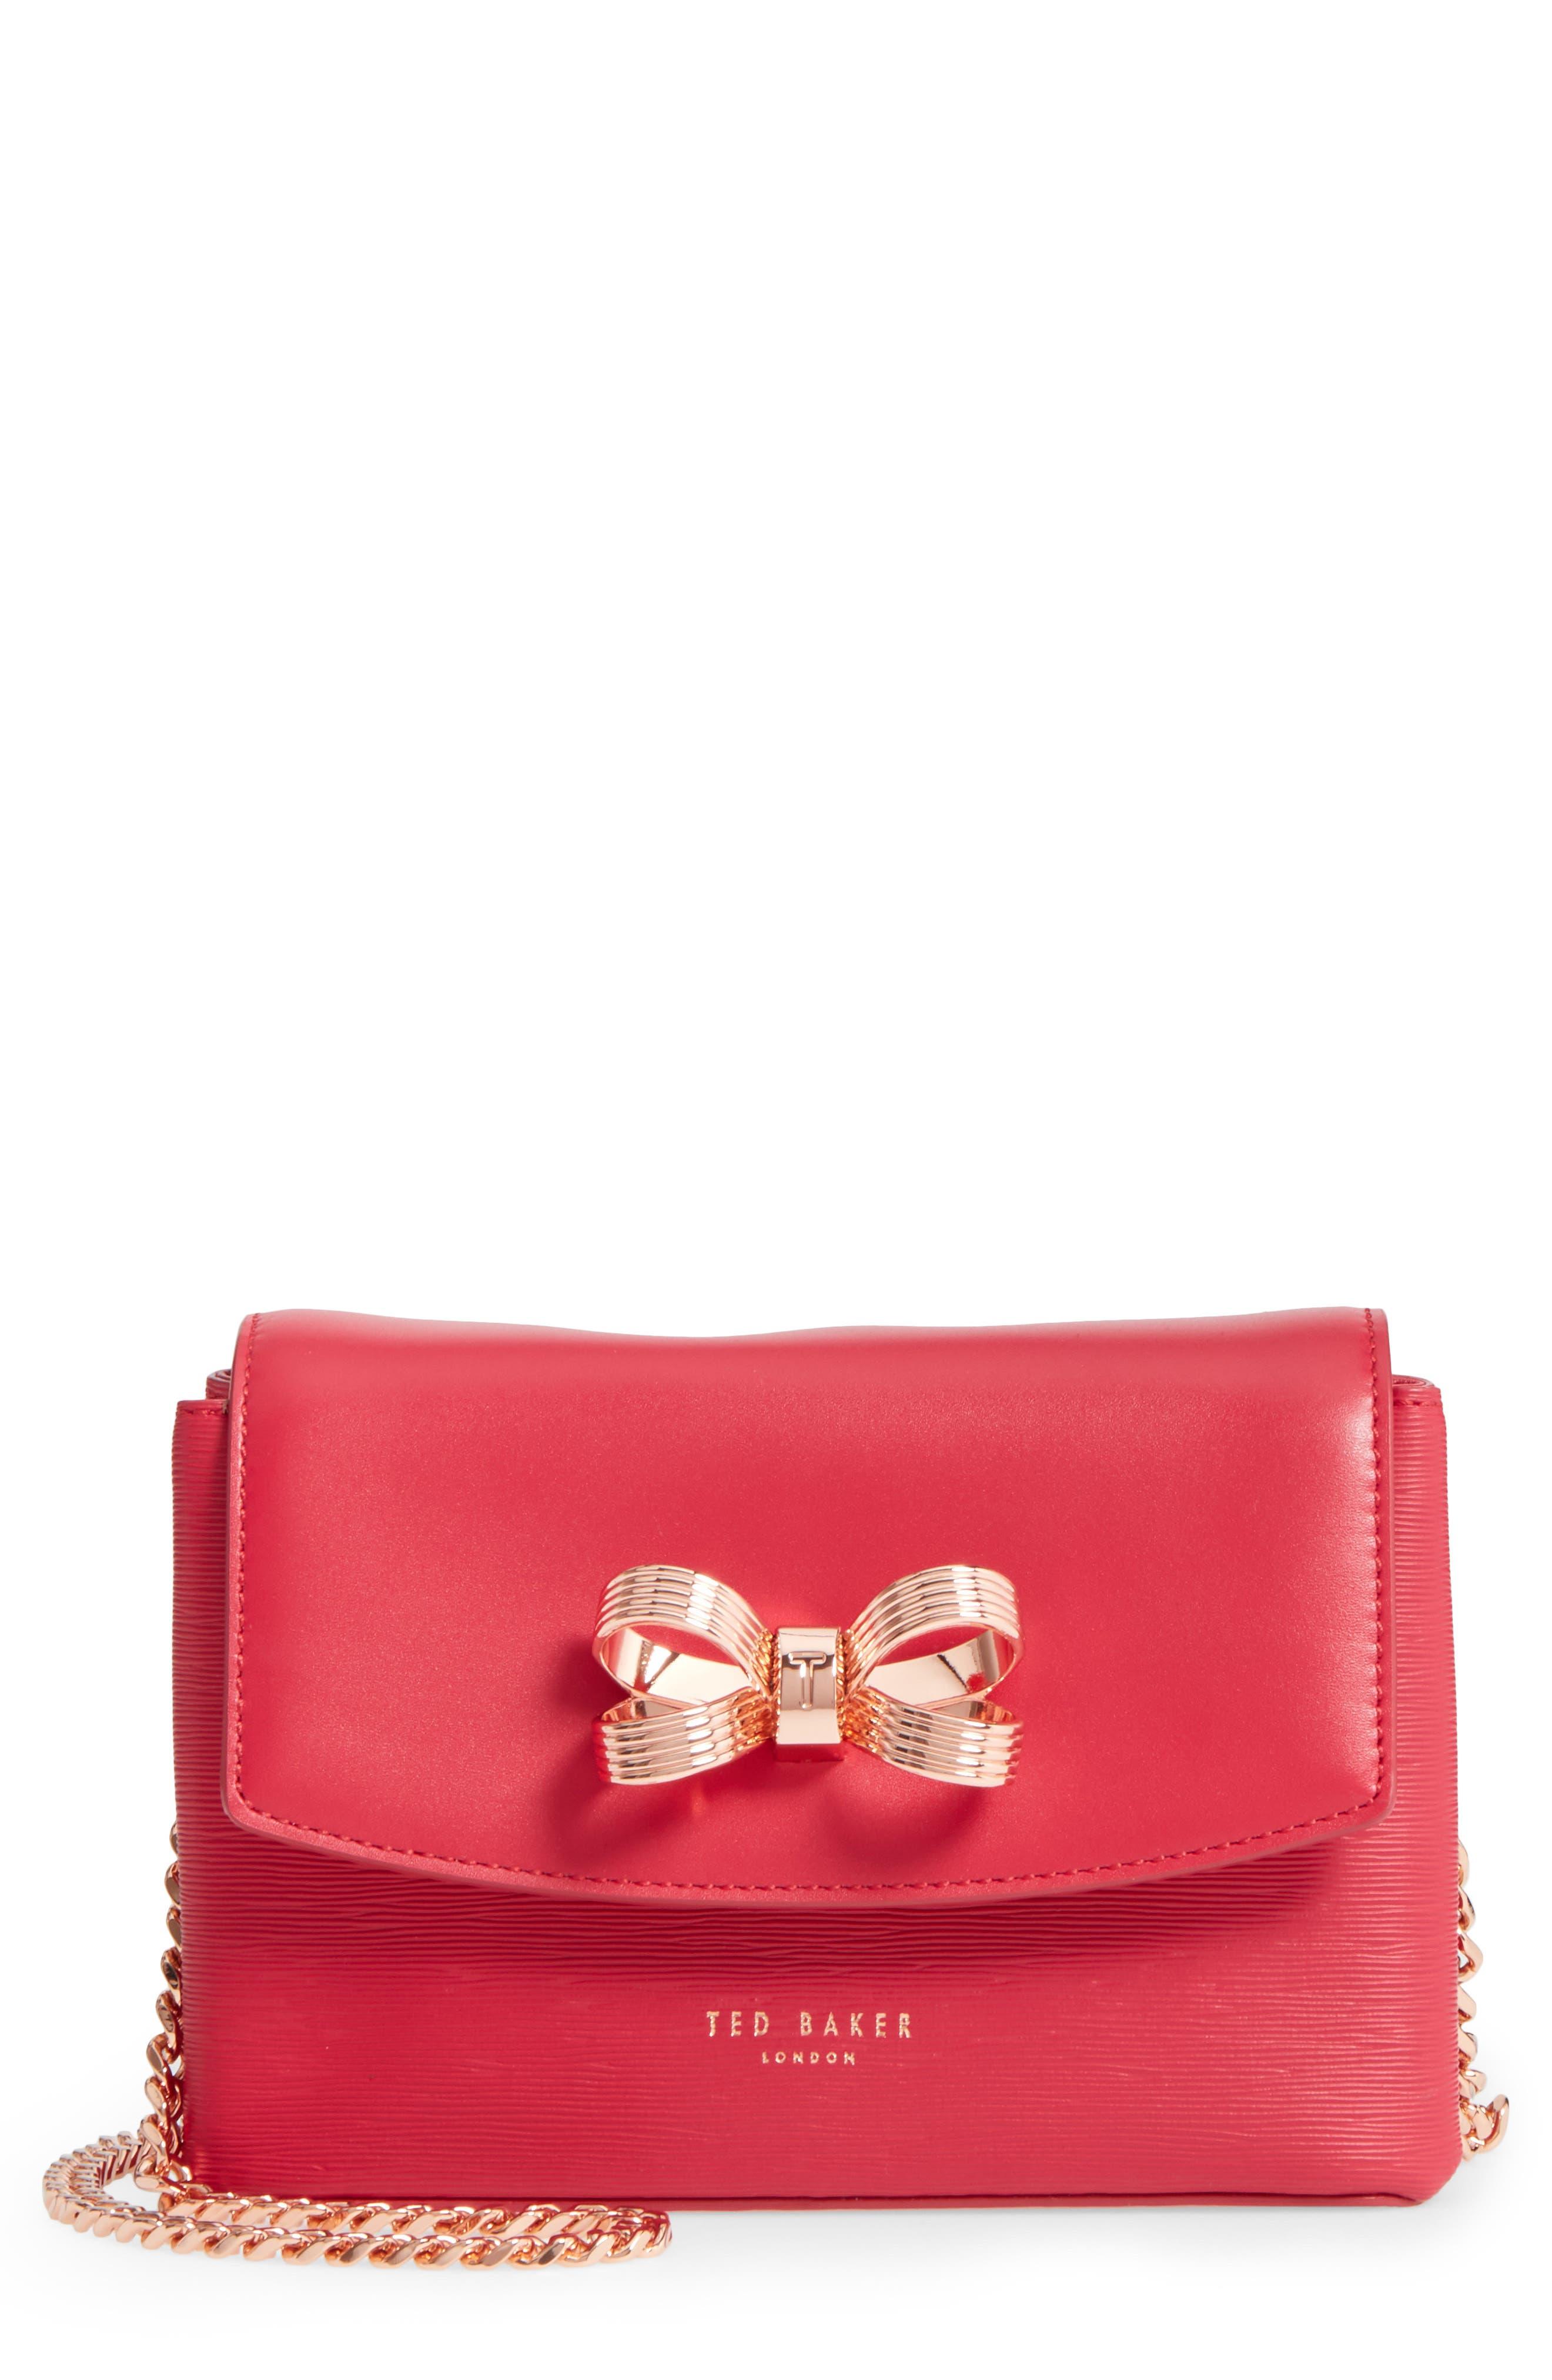 Ted Baker London Leorr Bow Leather Crossbody Bag